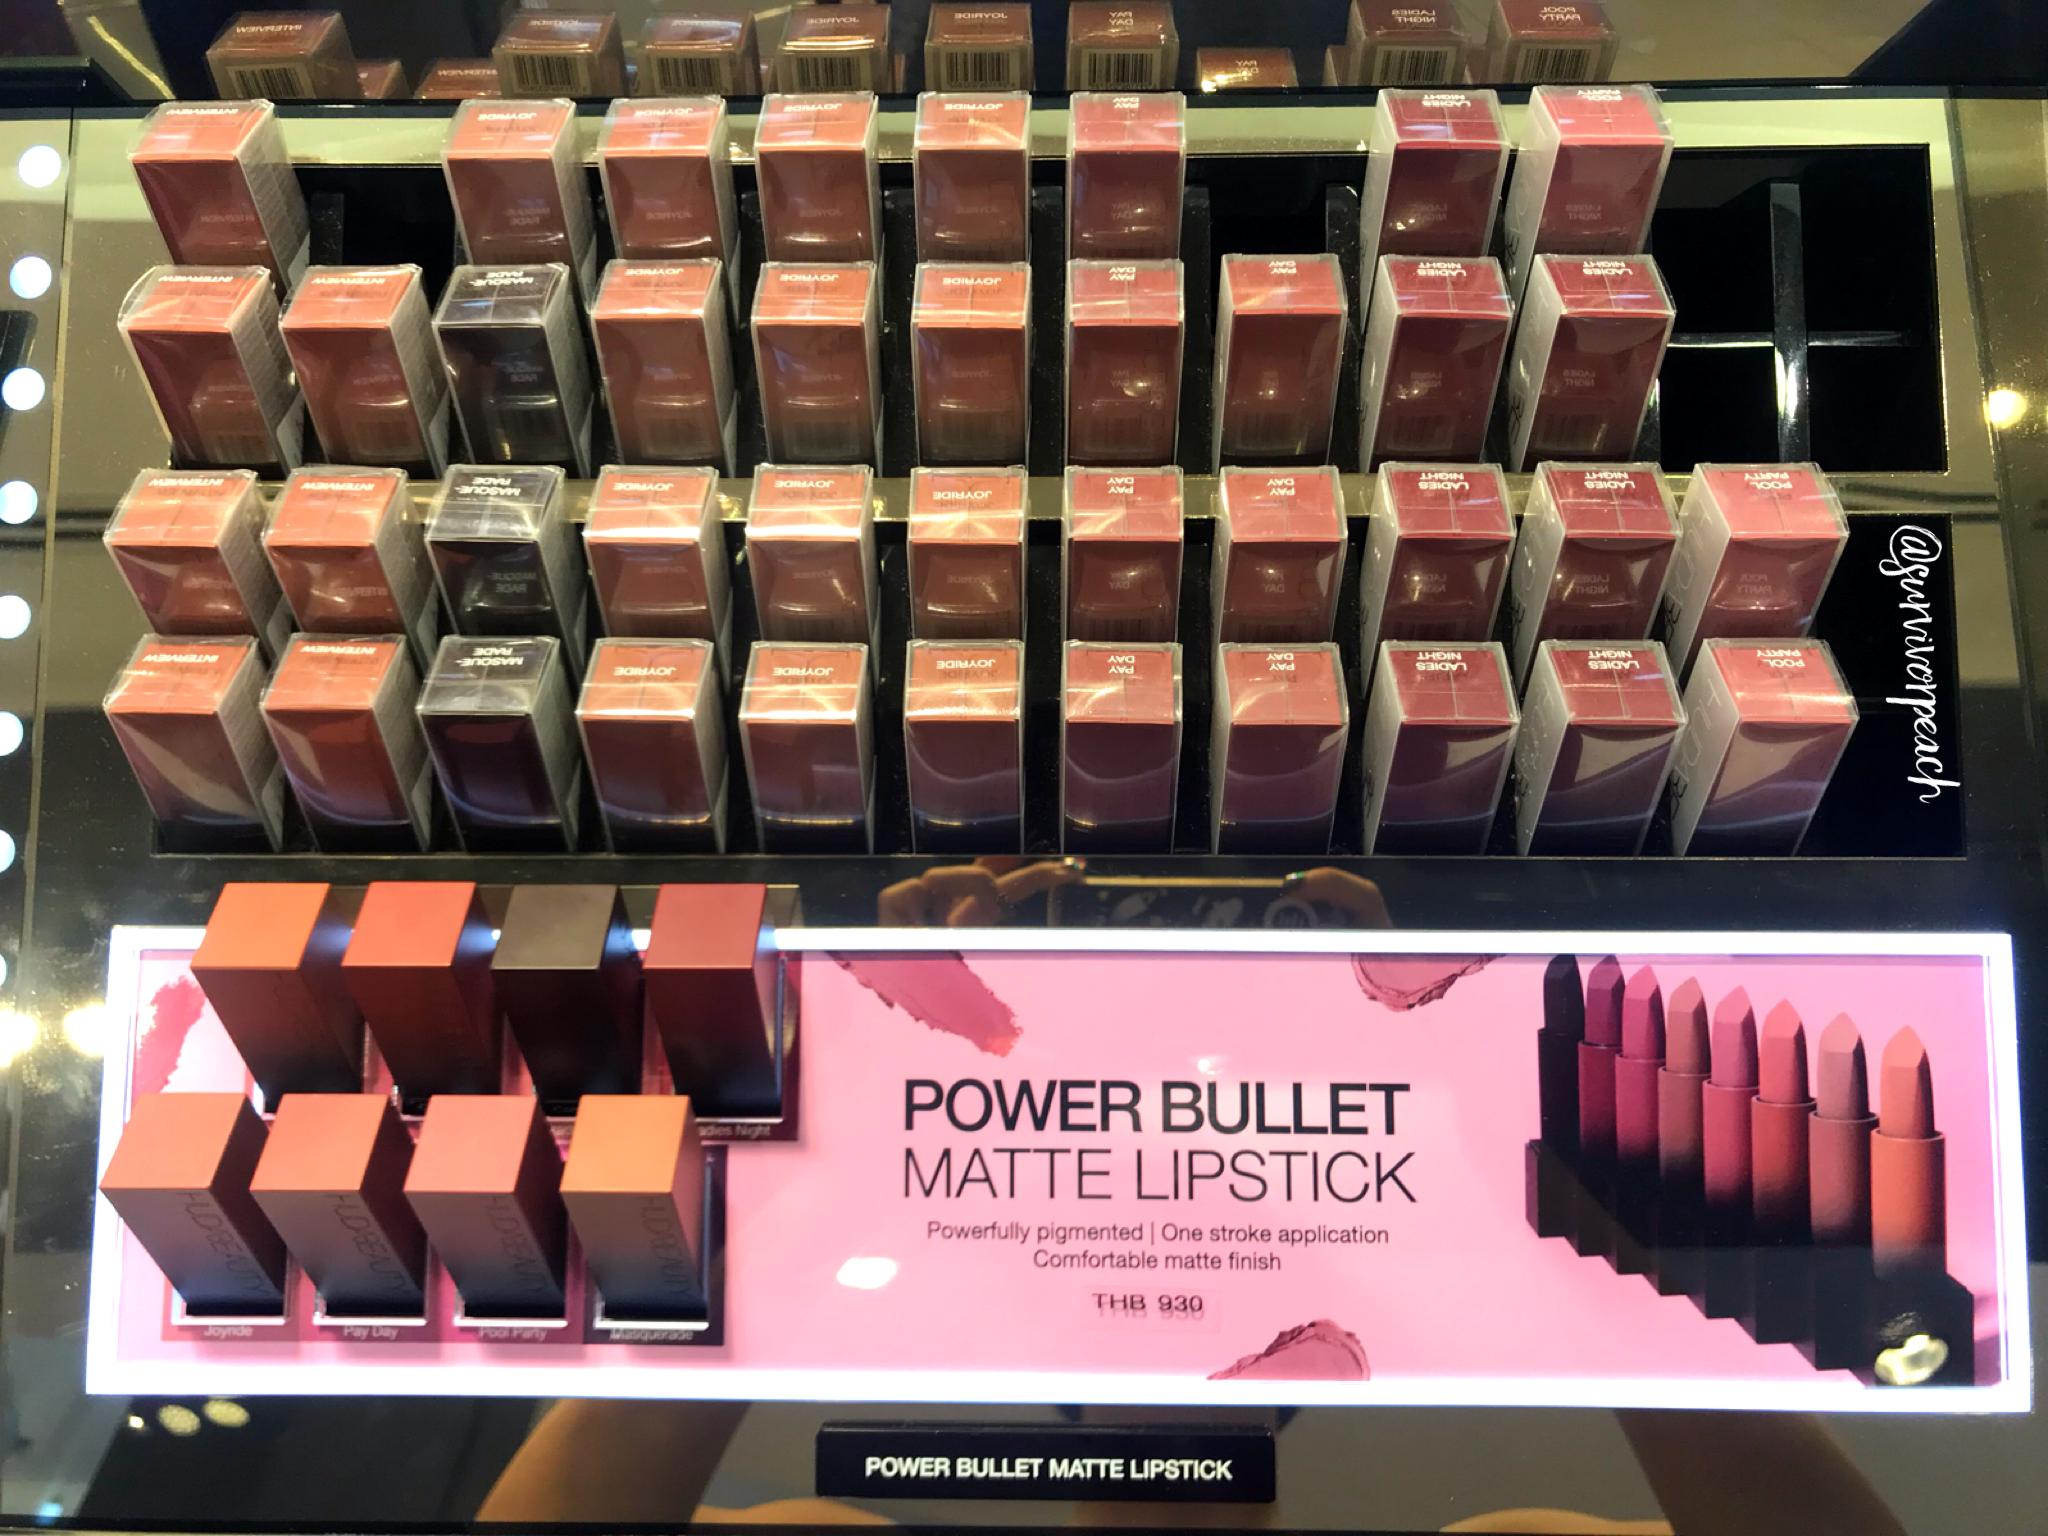 Huda Beauty Power Bullet Matte Lipsticks